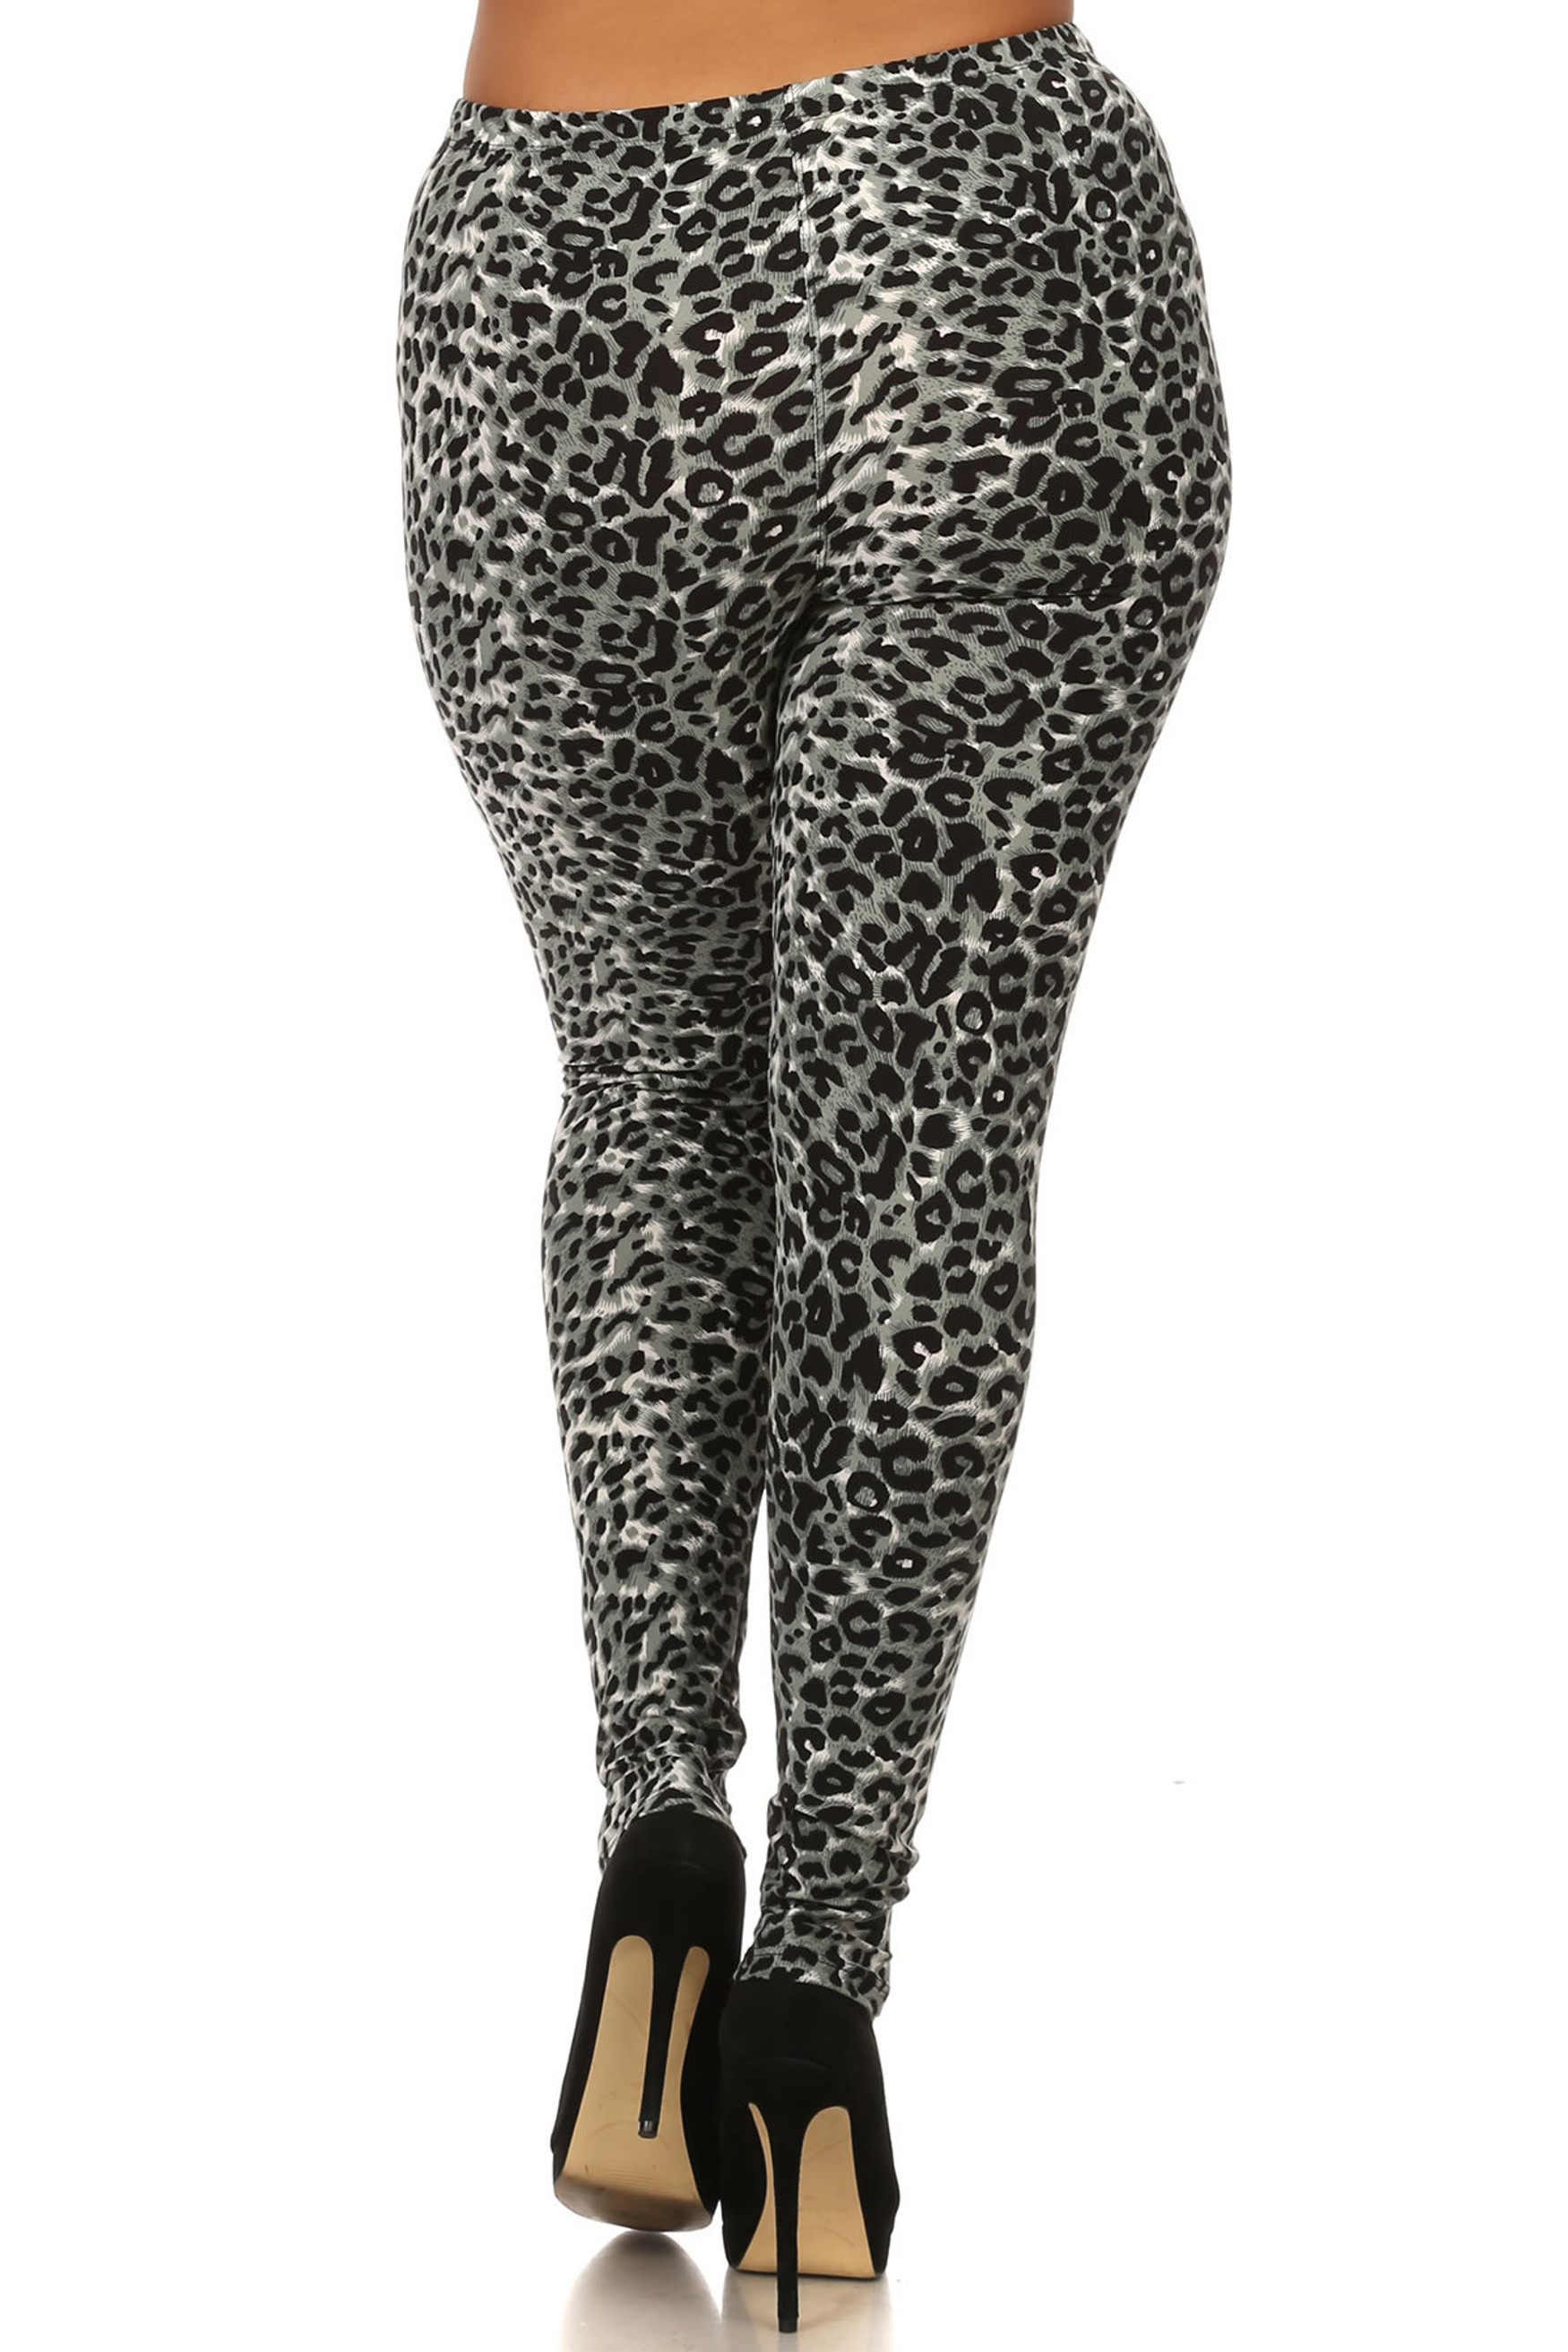 Brushed  Snow Leopard Extra Plus Size Leggings - 3X-5X